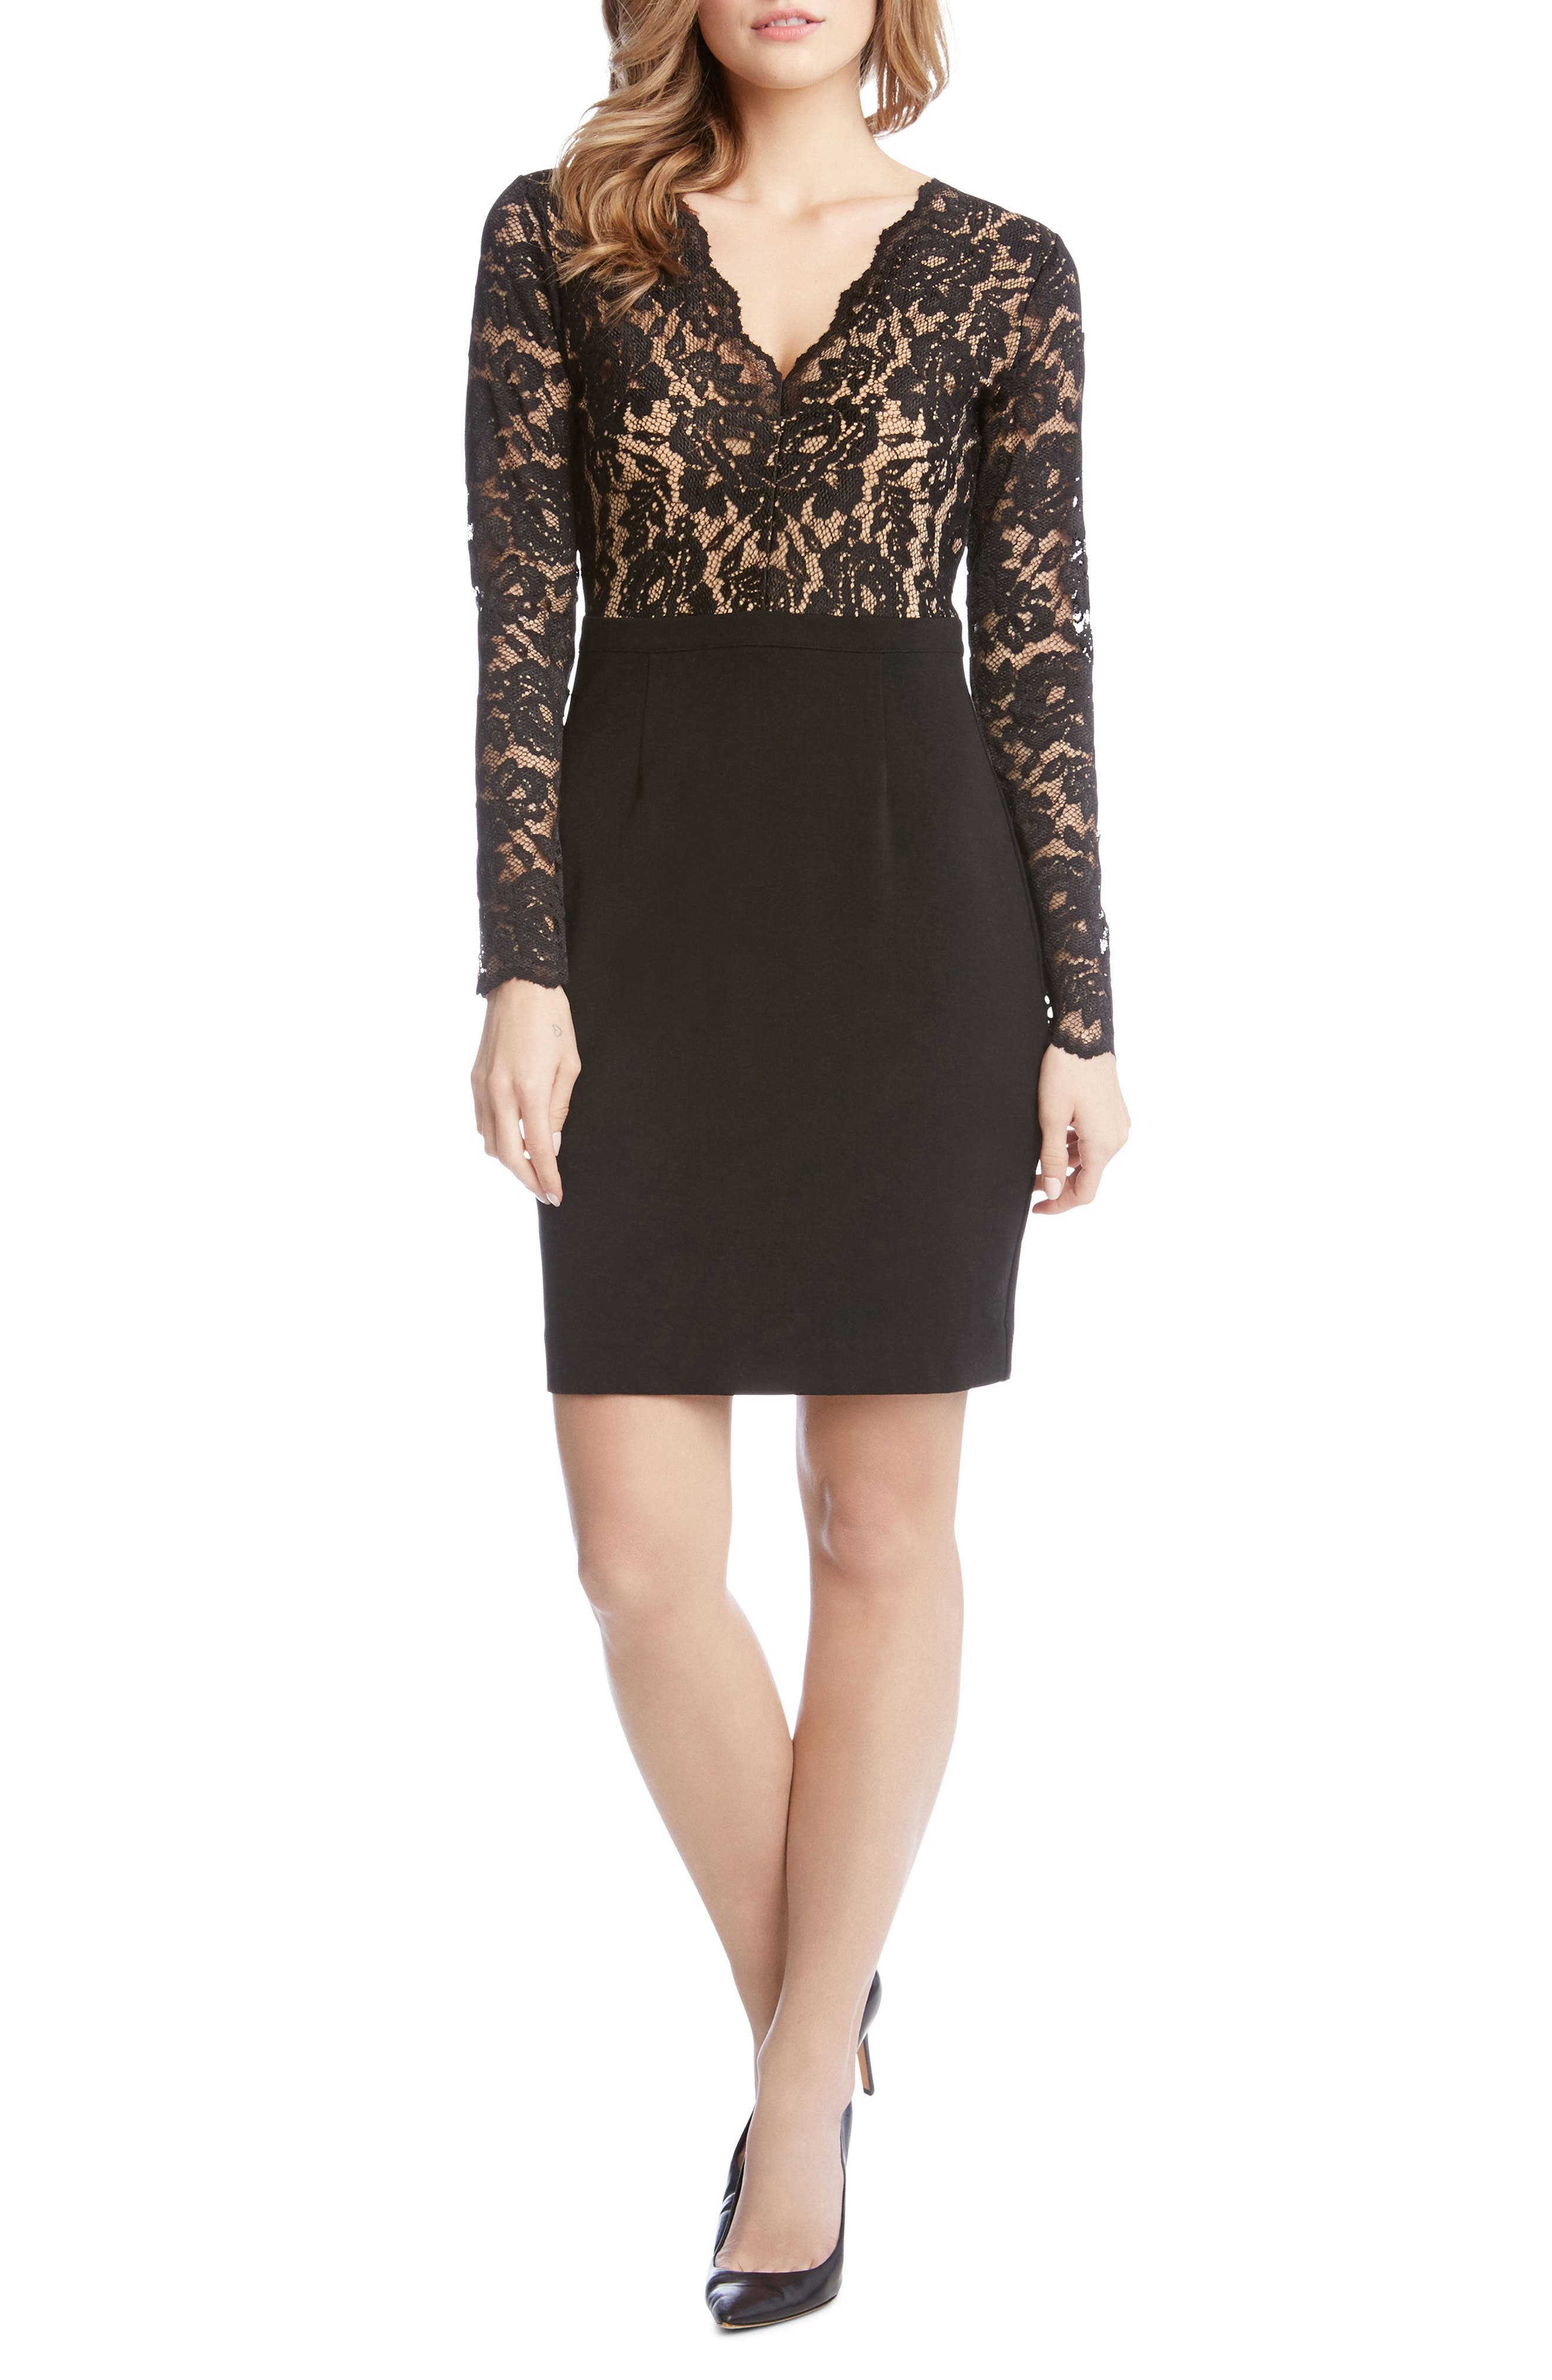 Becca Lace & Knit Sheath Dress,                         Main,                         color, Black/ Nude